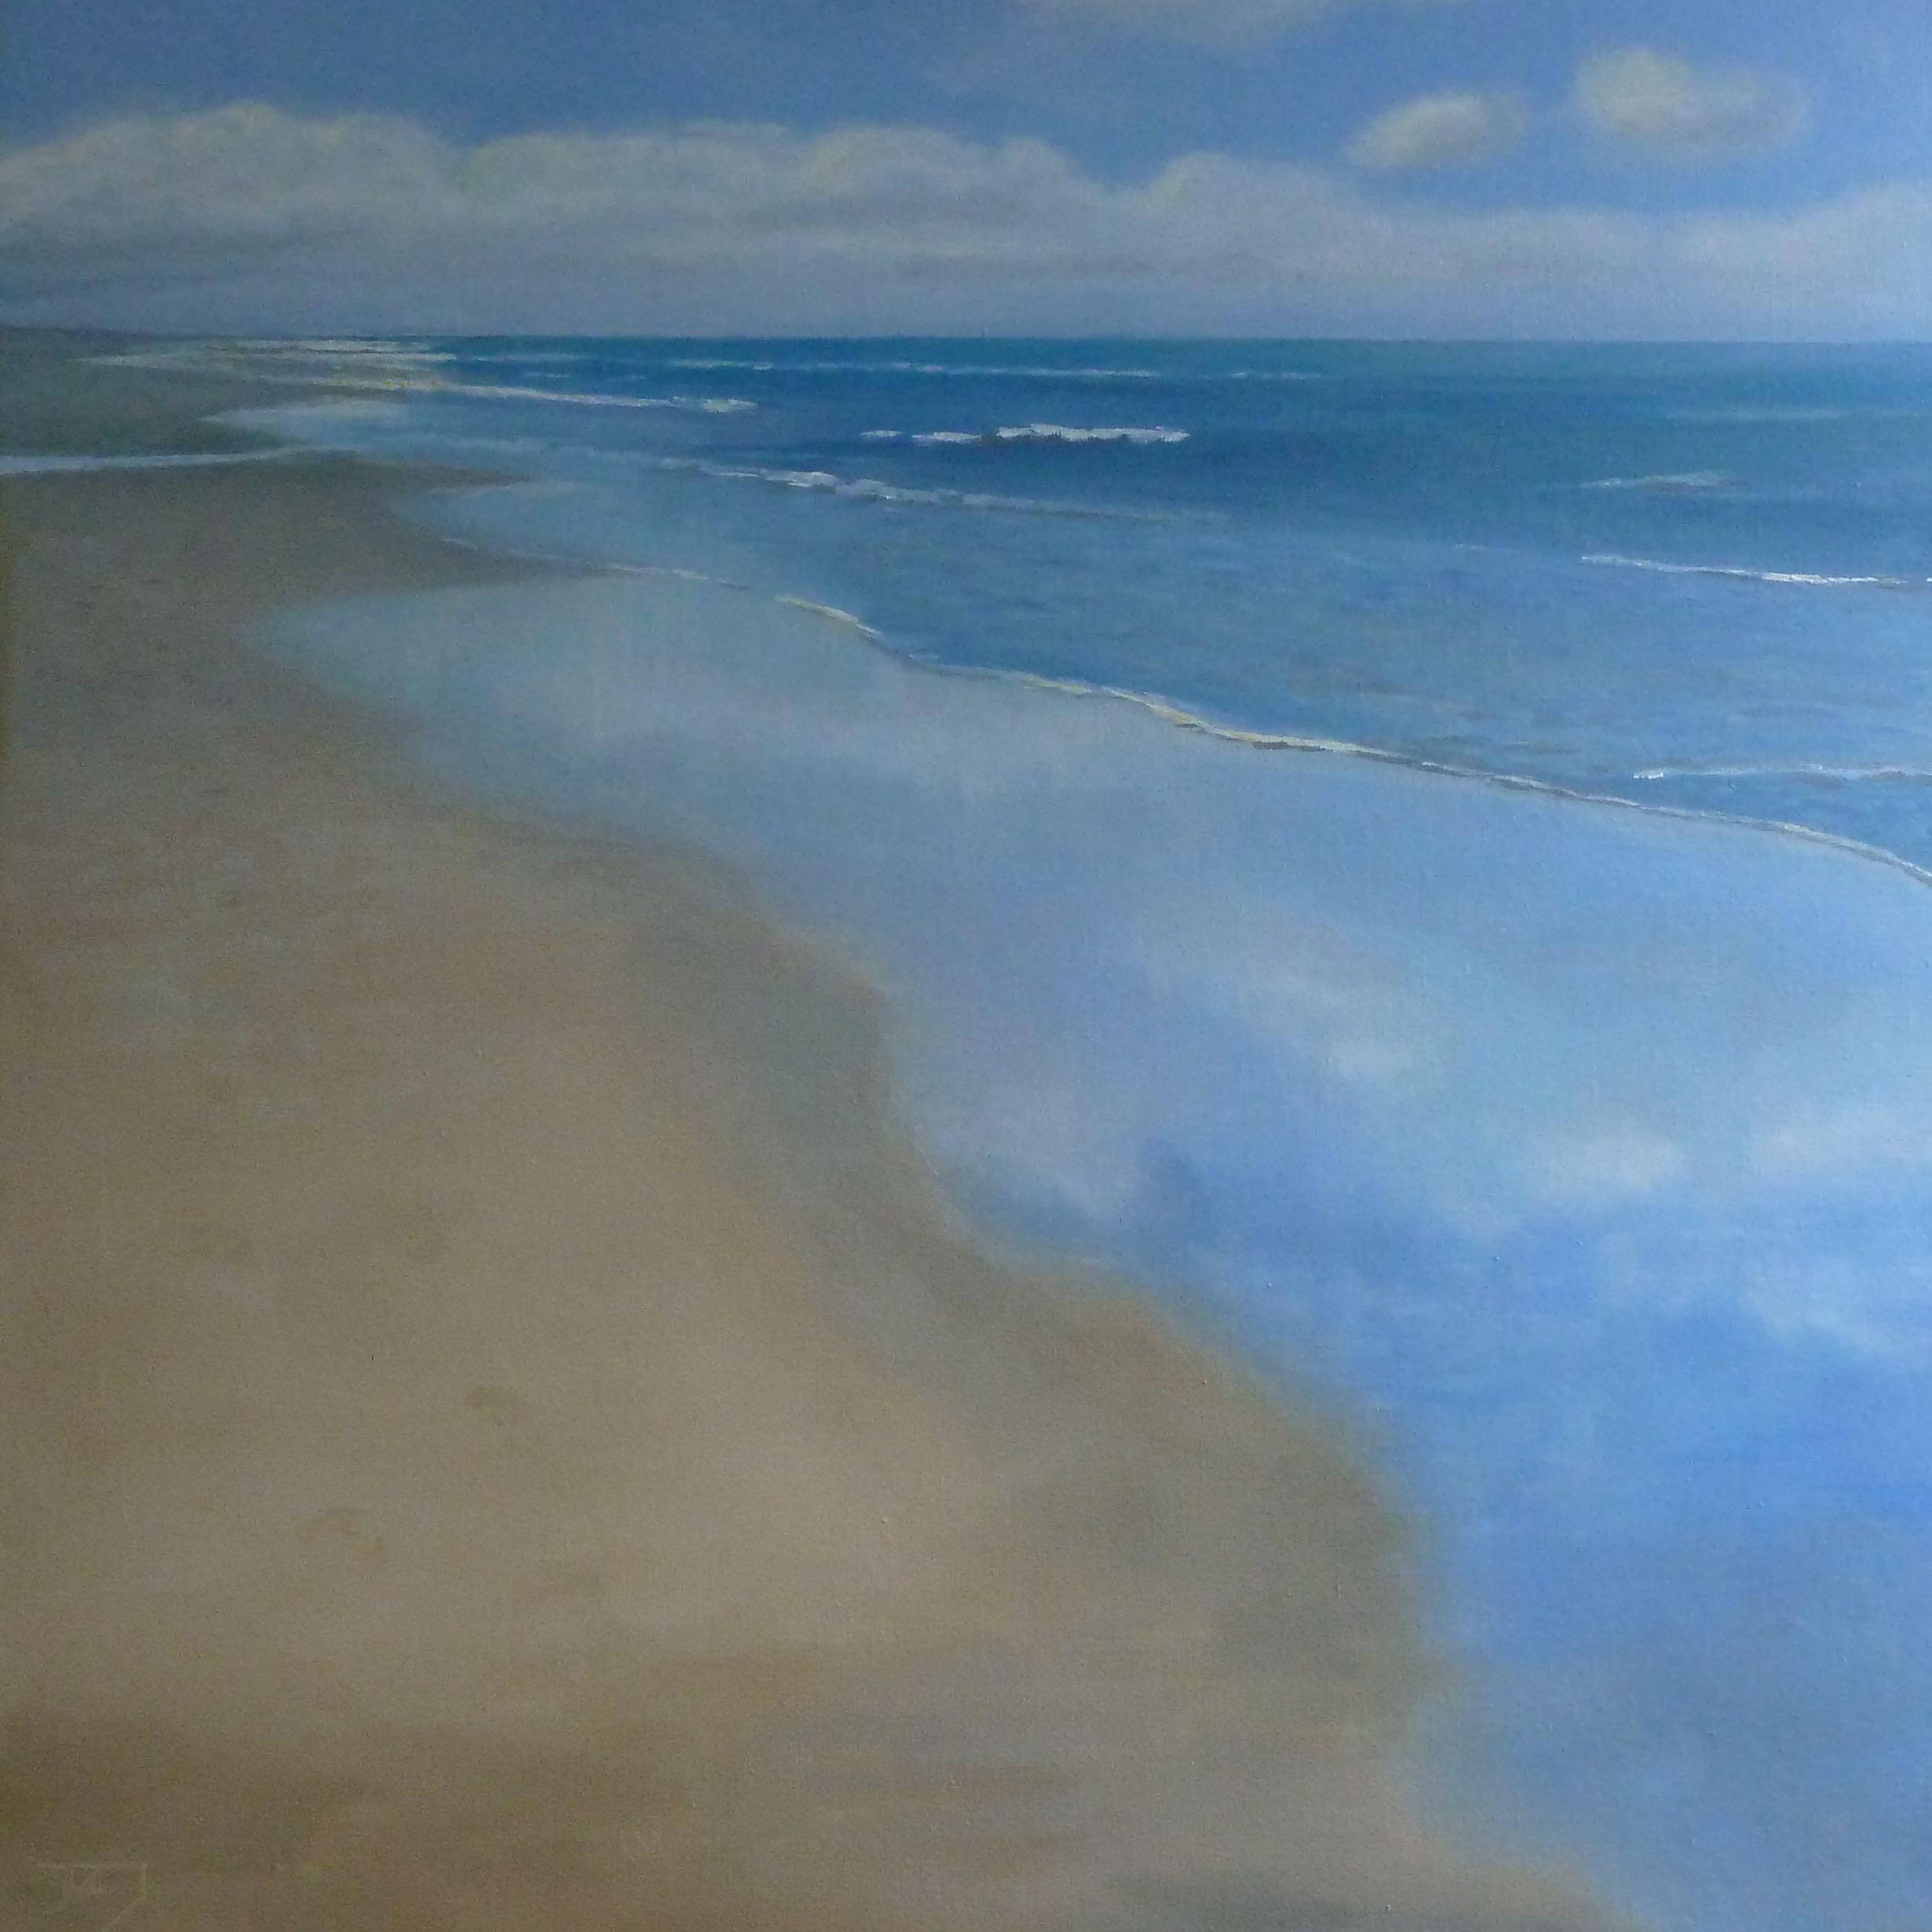 Strandwandeling 2, 80/80 cm, olieverf op doek